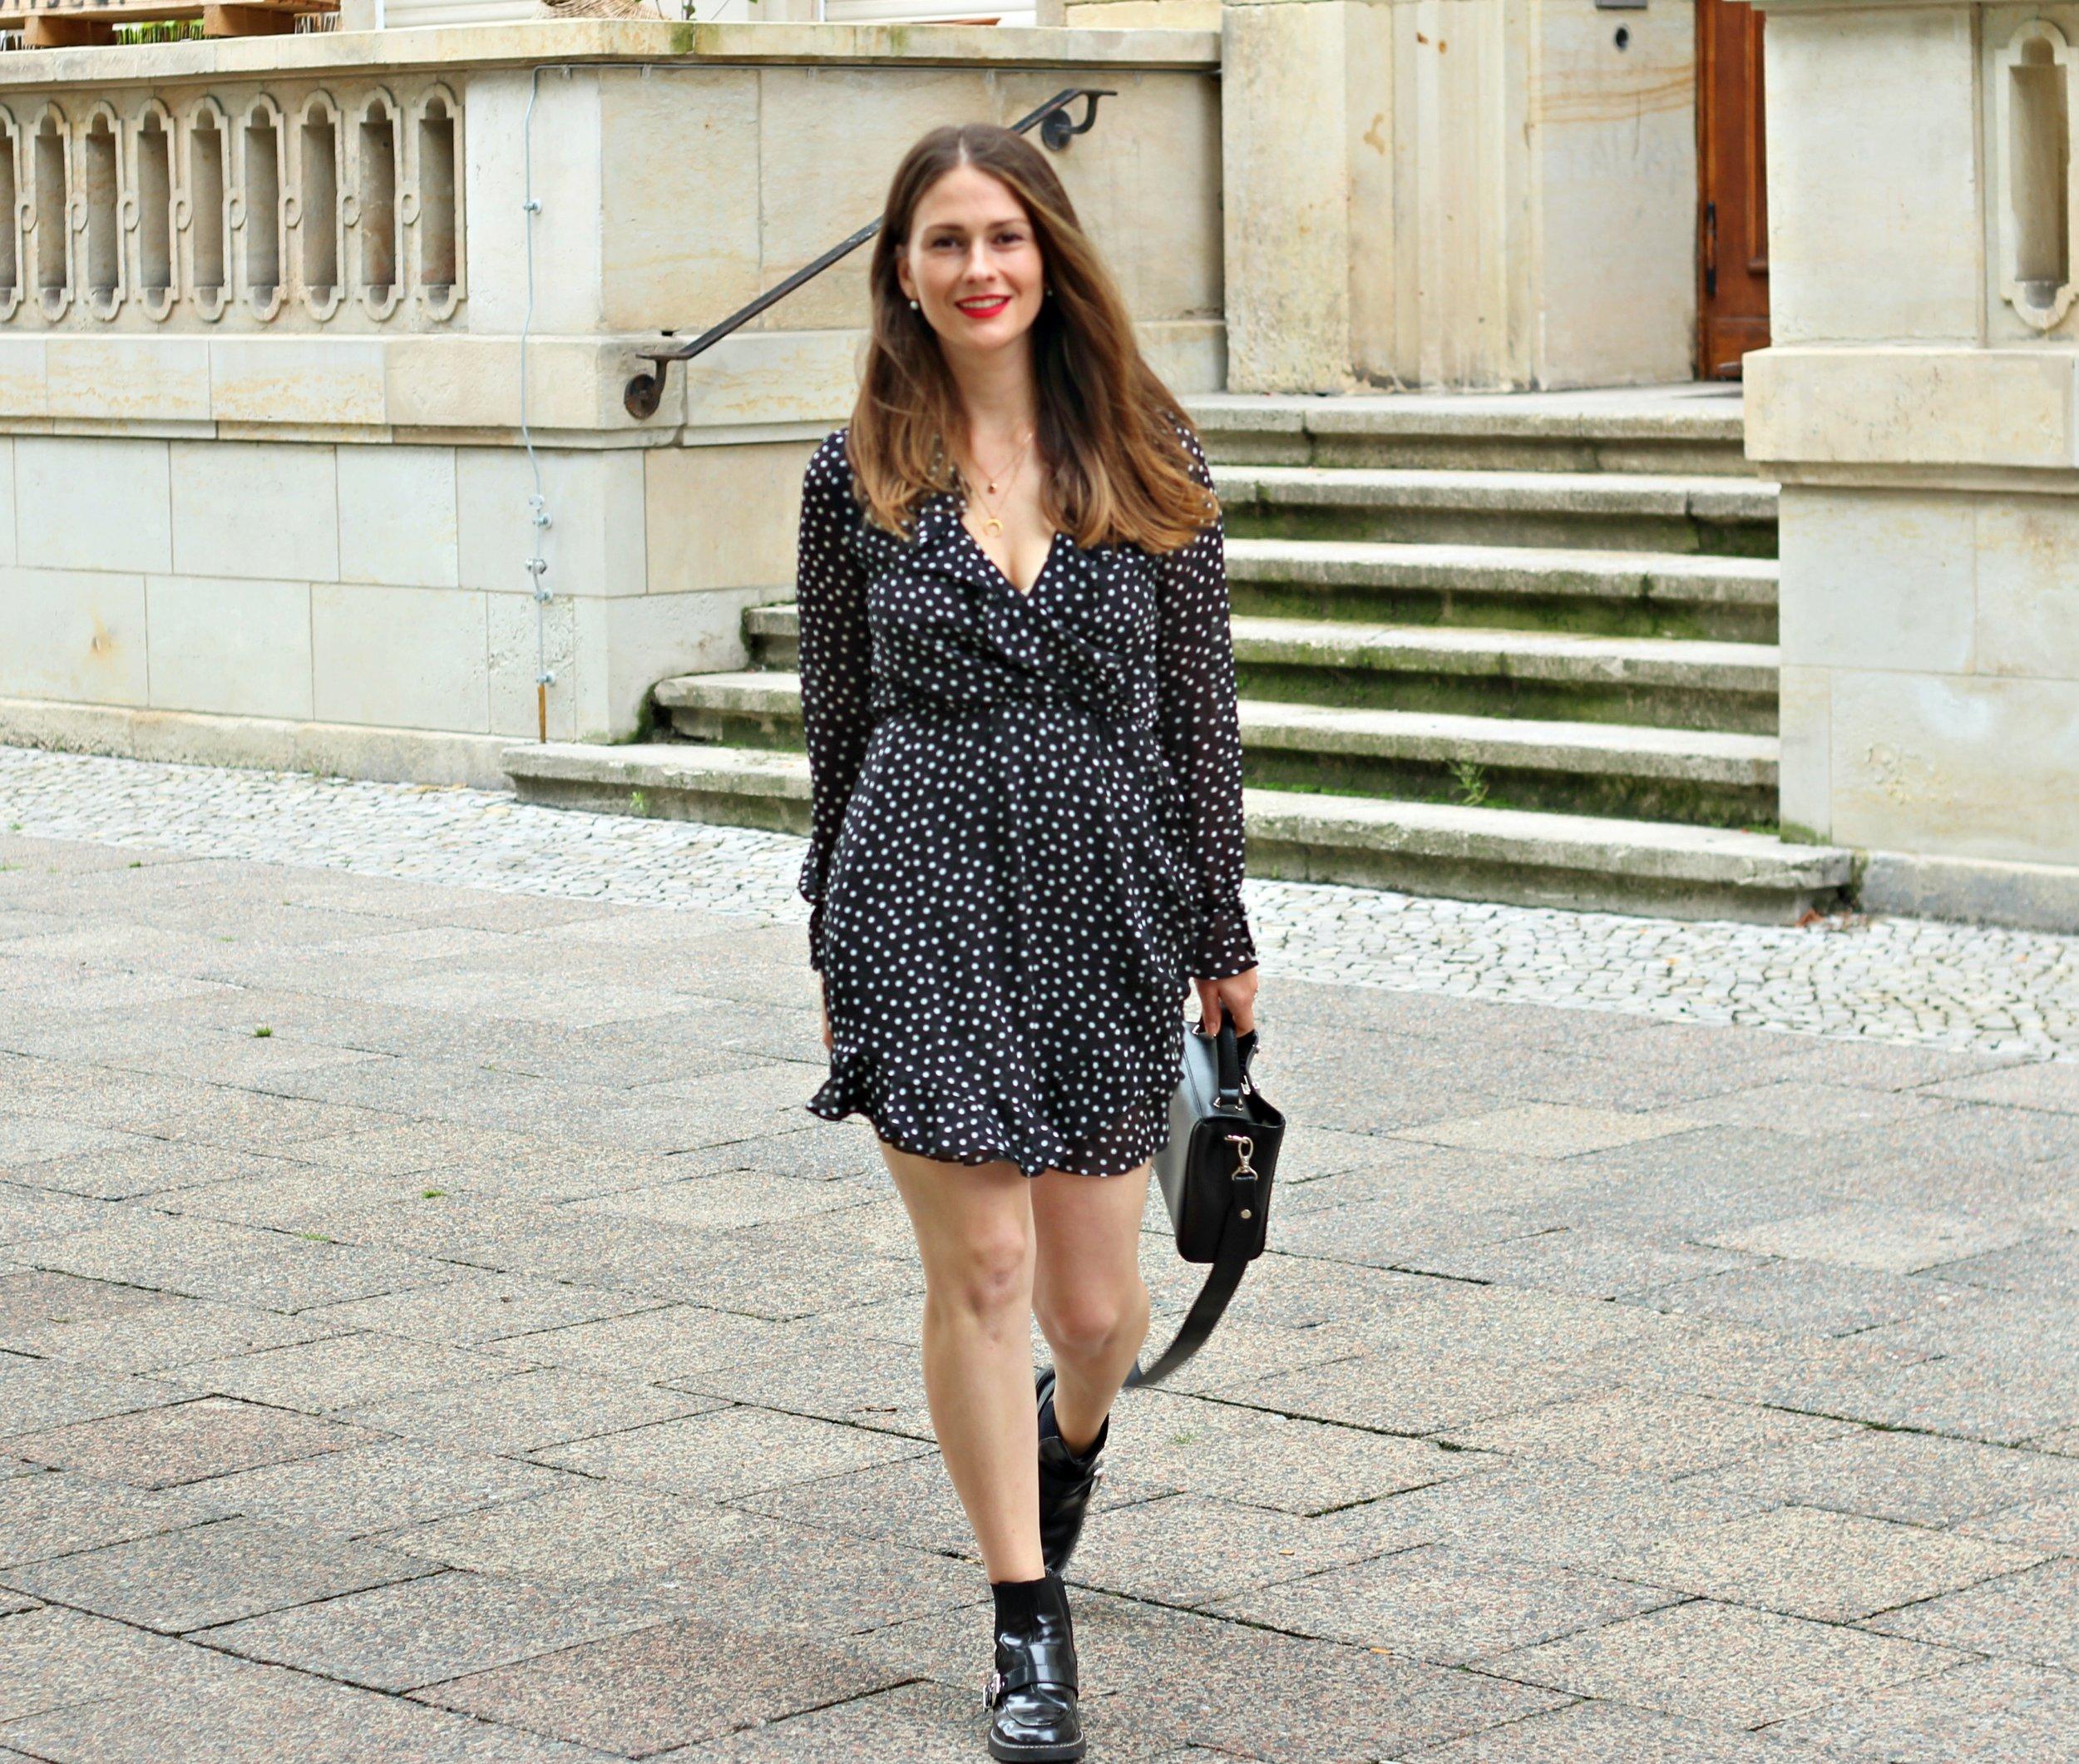 IMG_6896annaporter-wrap-dress-h&m-polka-dot-2